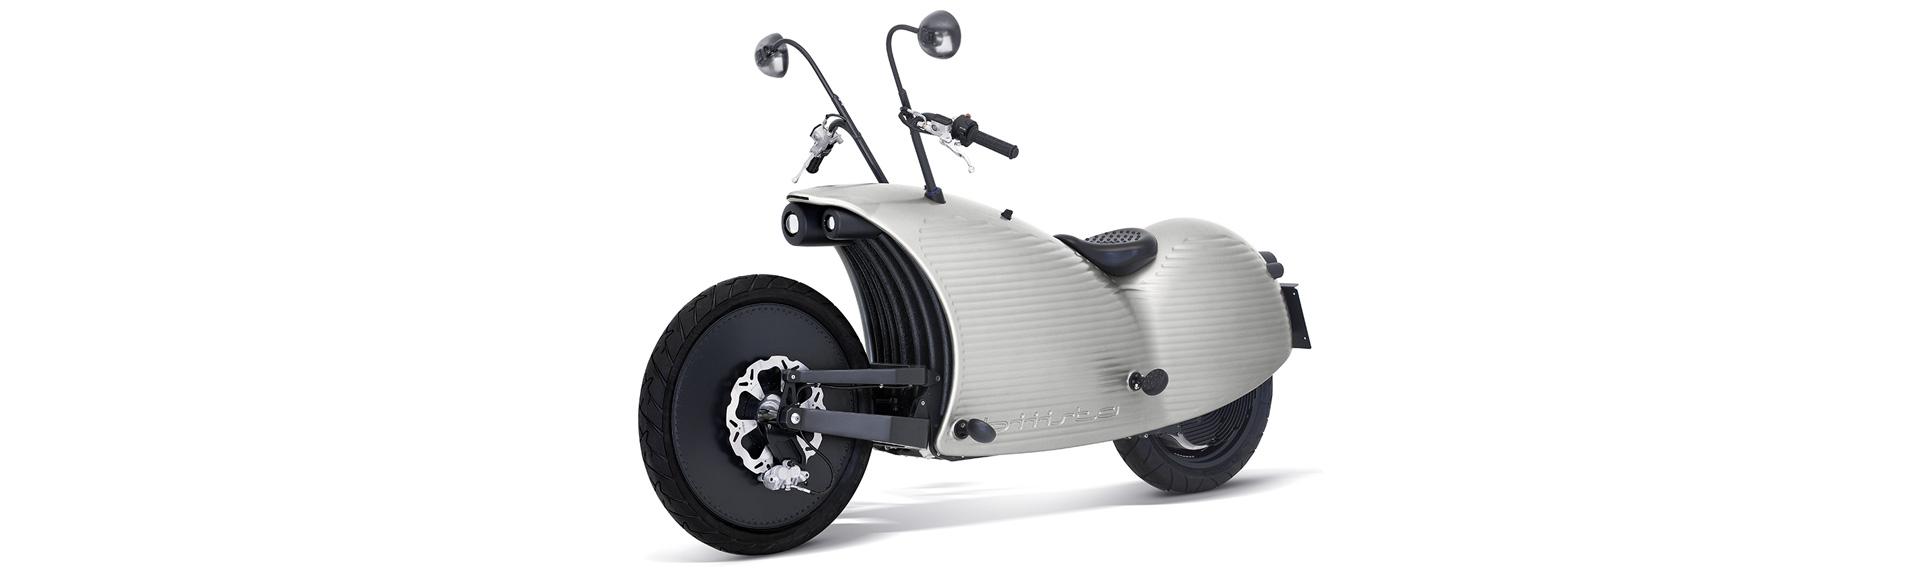 Polizza e-bike